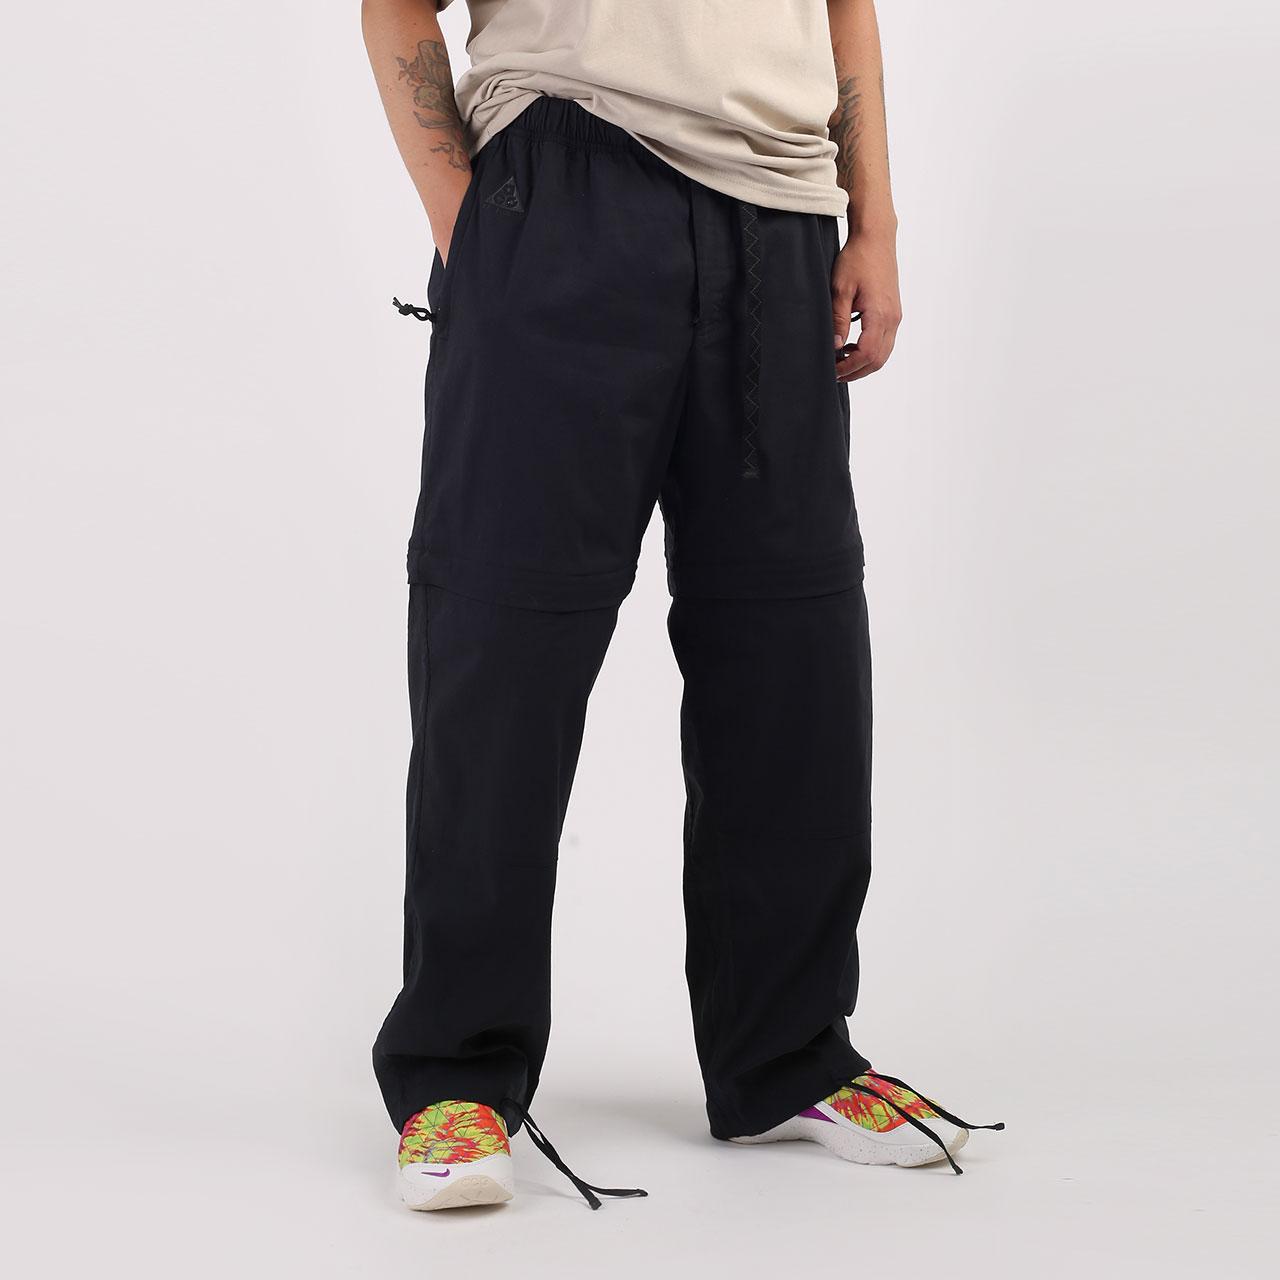 Черные мужские брюки ACG Convertible Trousers от Nike (CK6863-010) по цене 7340 рублей